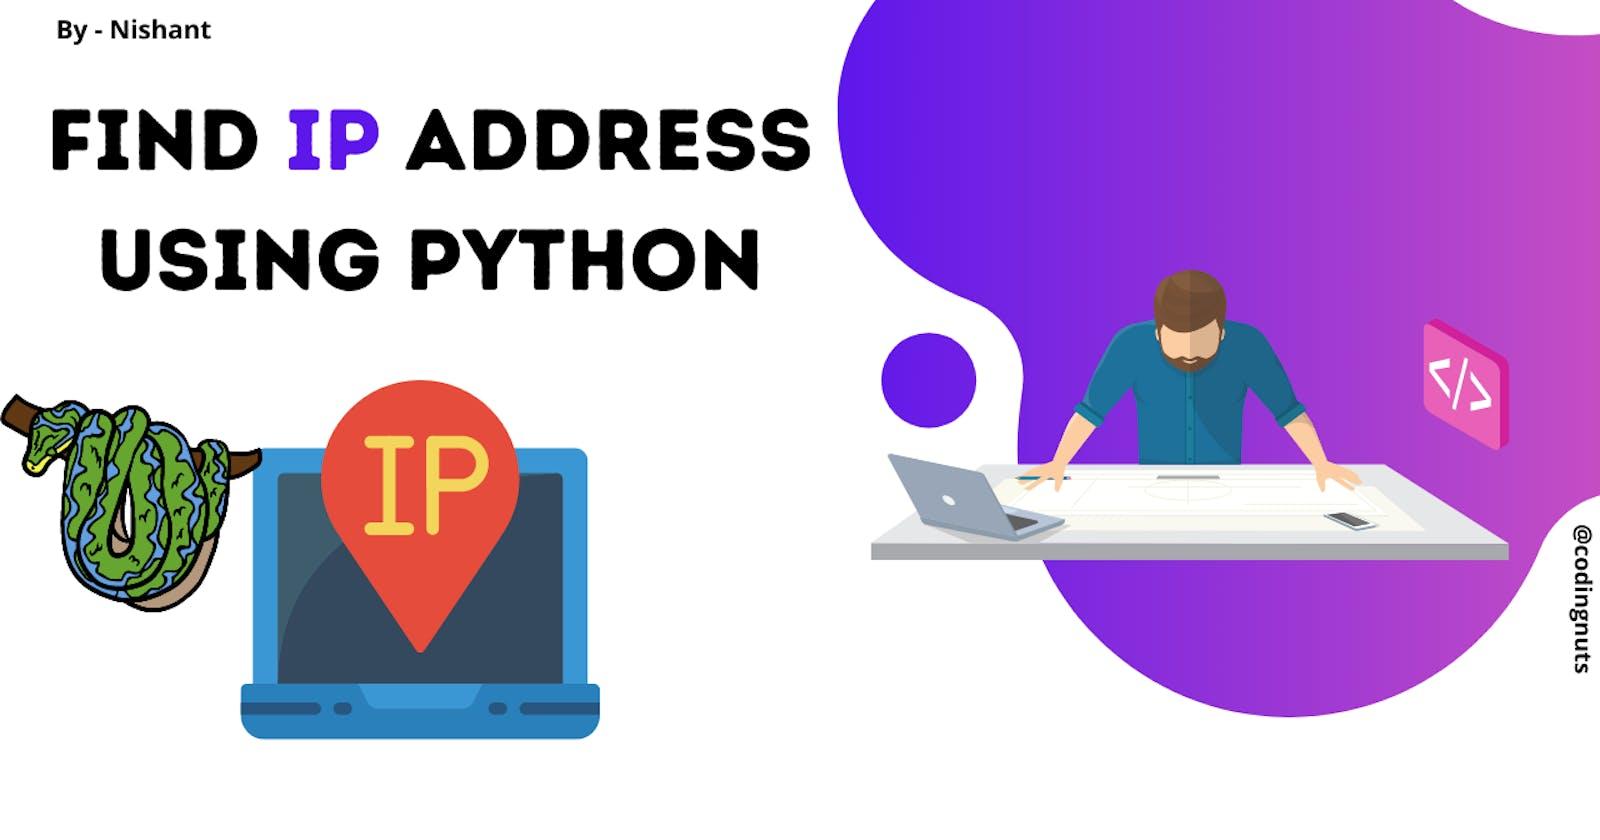 Display Hostname and IP address using Python